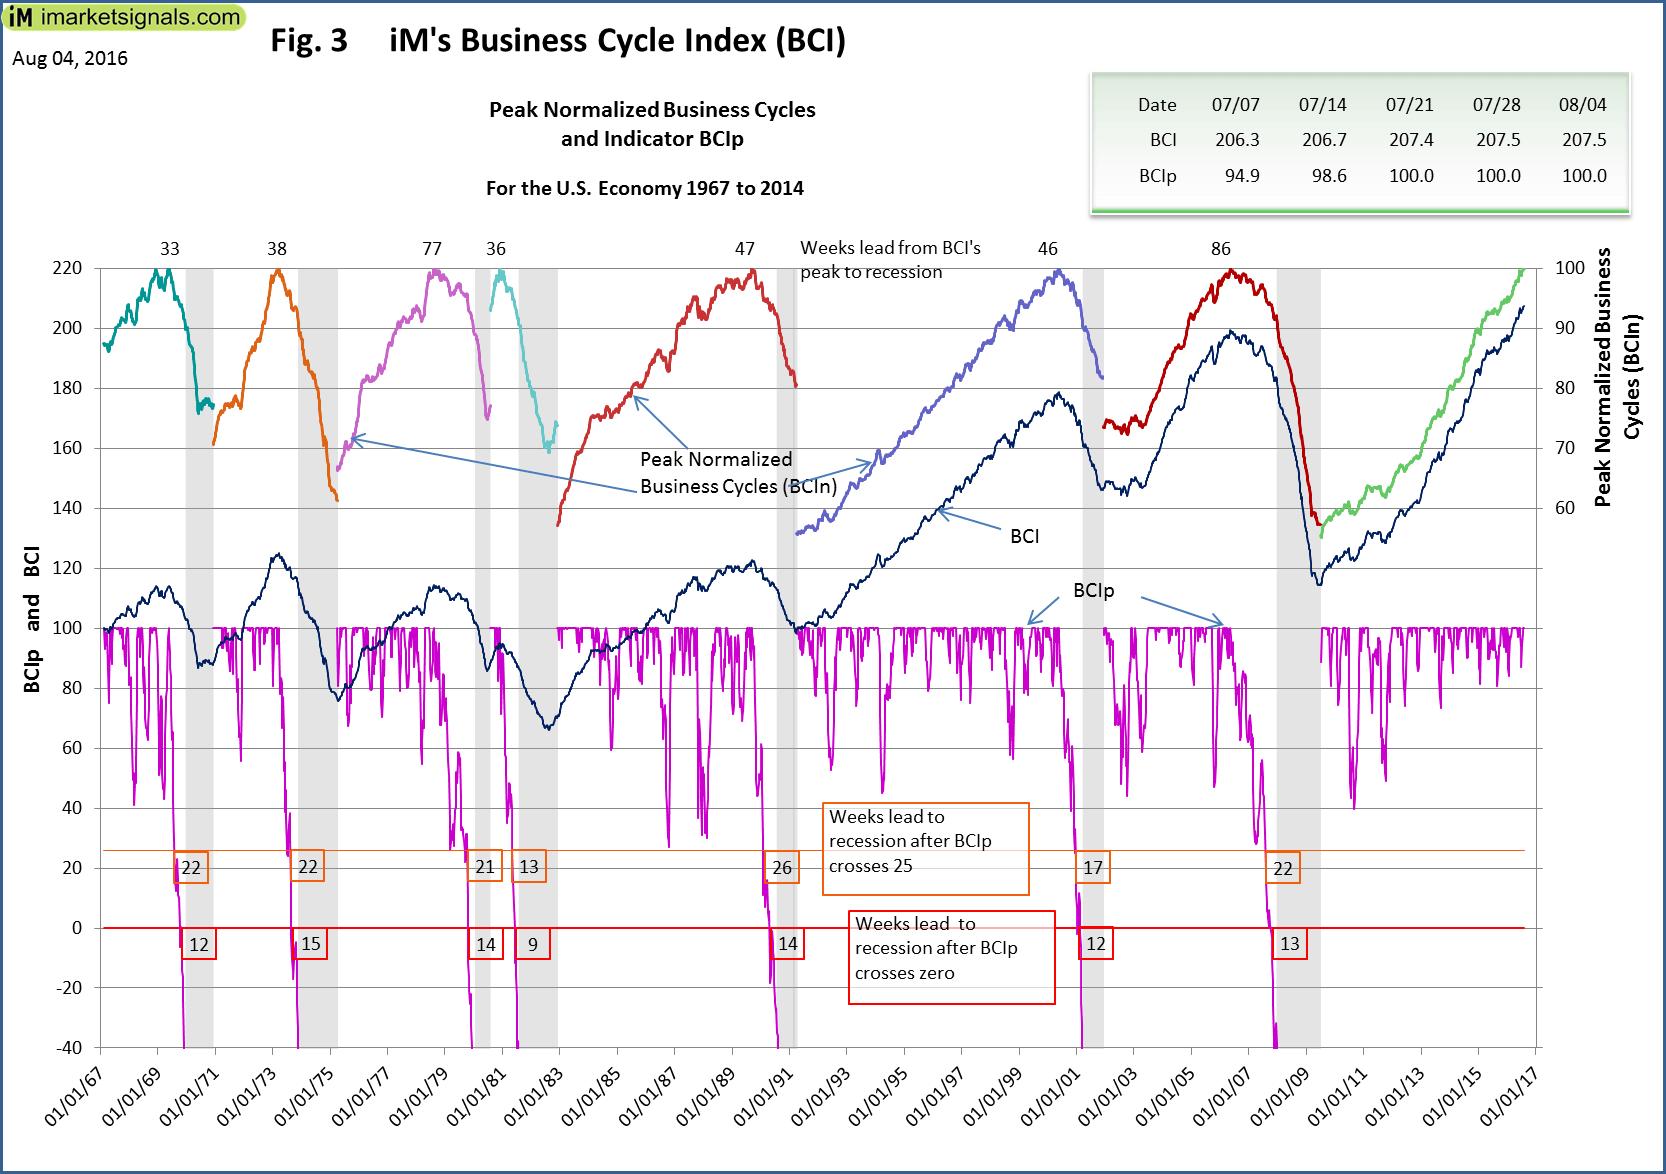 BCI-Fig-3-8-4-2016